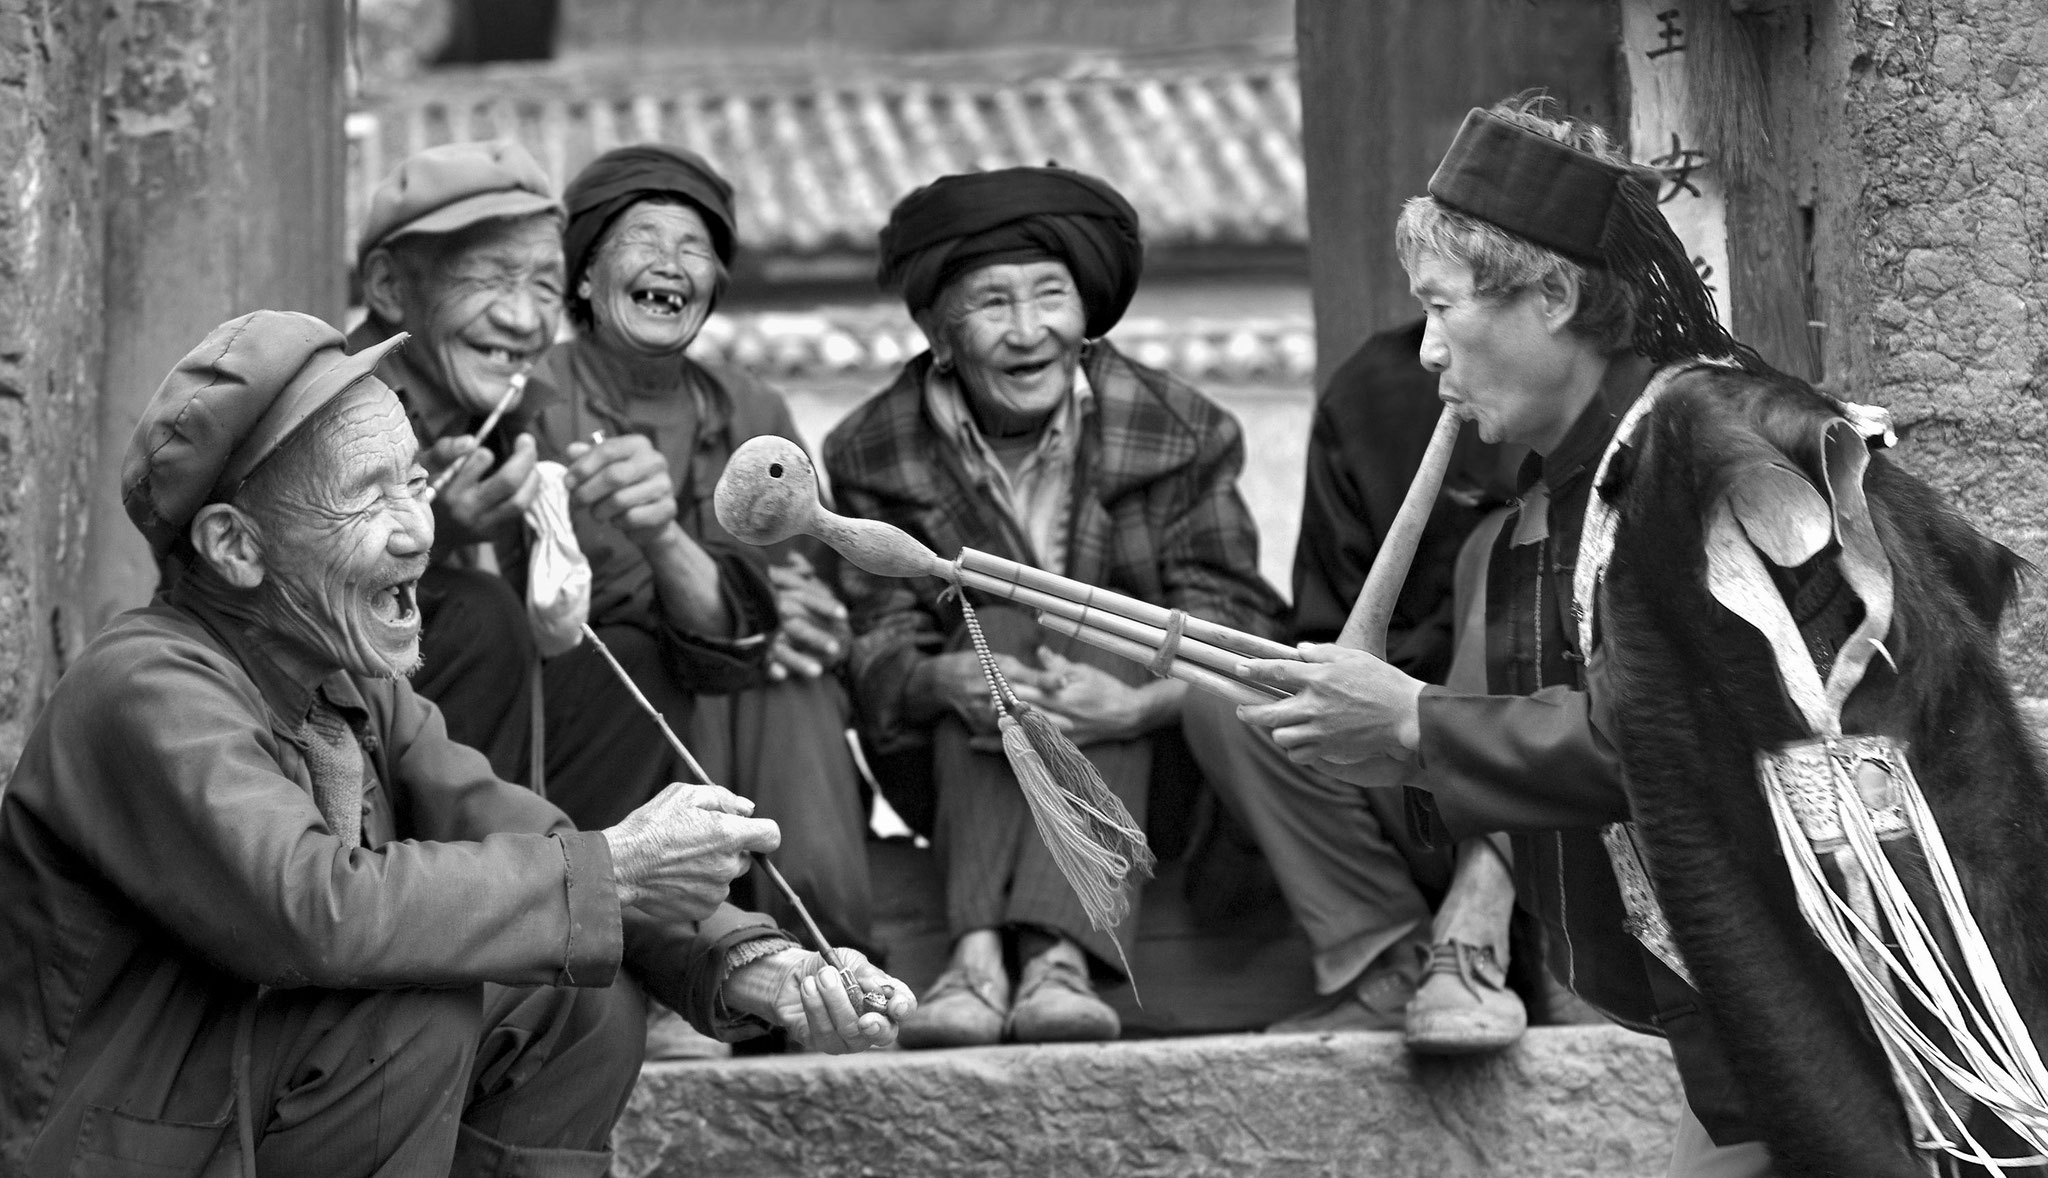 ZHU Ruisheng (China) - Happy smile